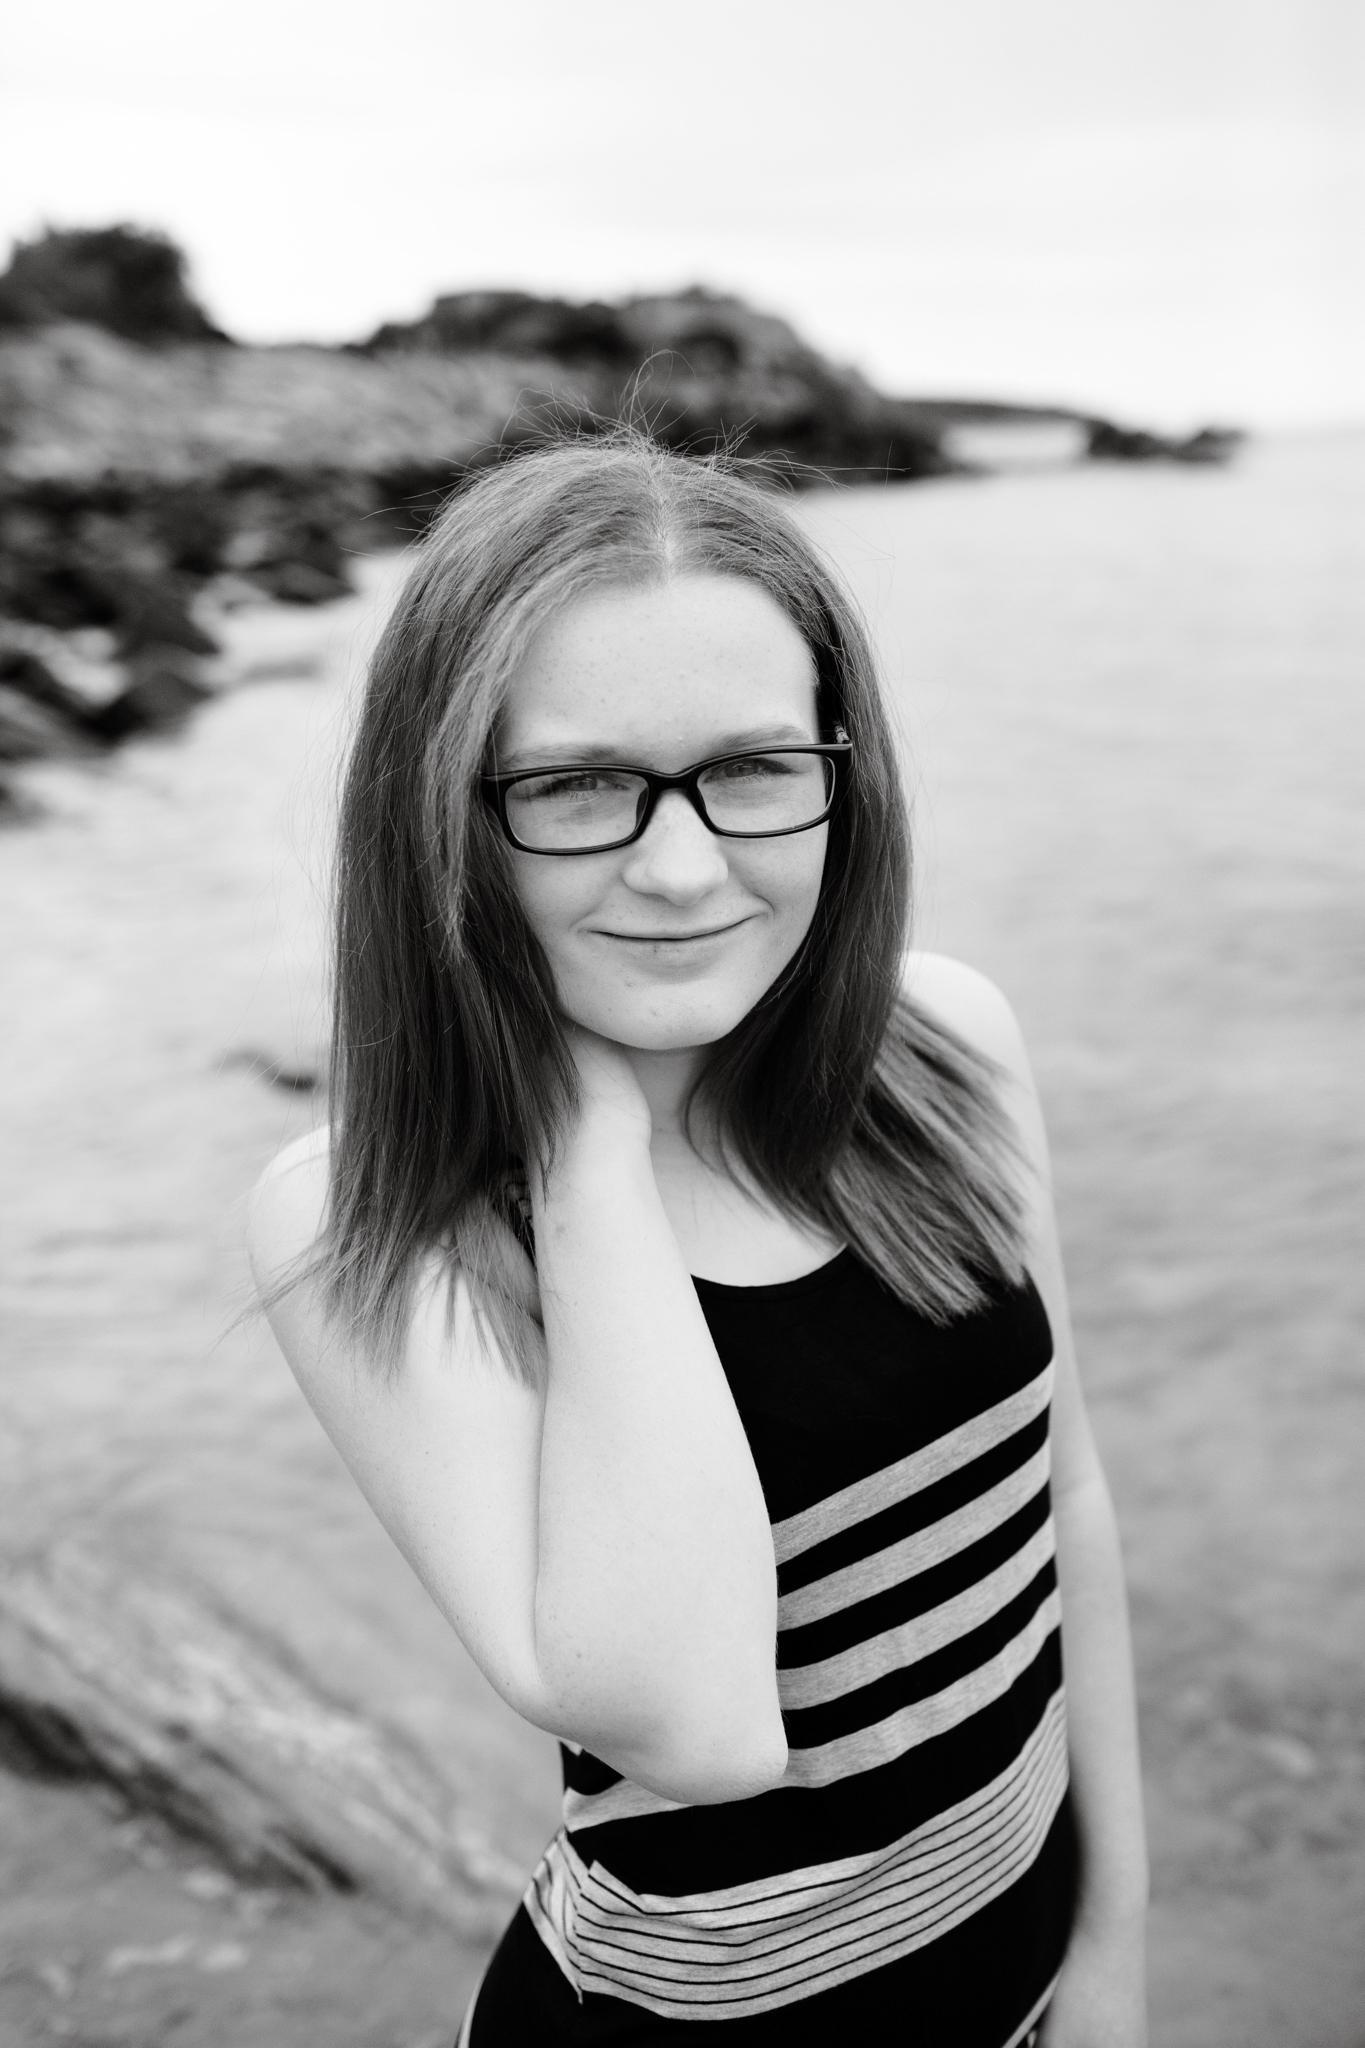 maine-senior-portrait-photographer -20.jpg